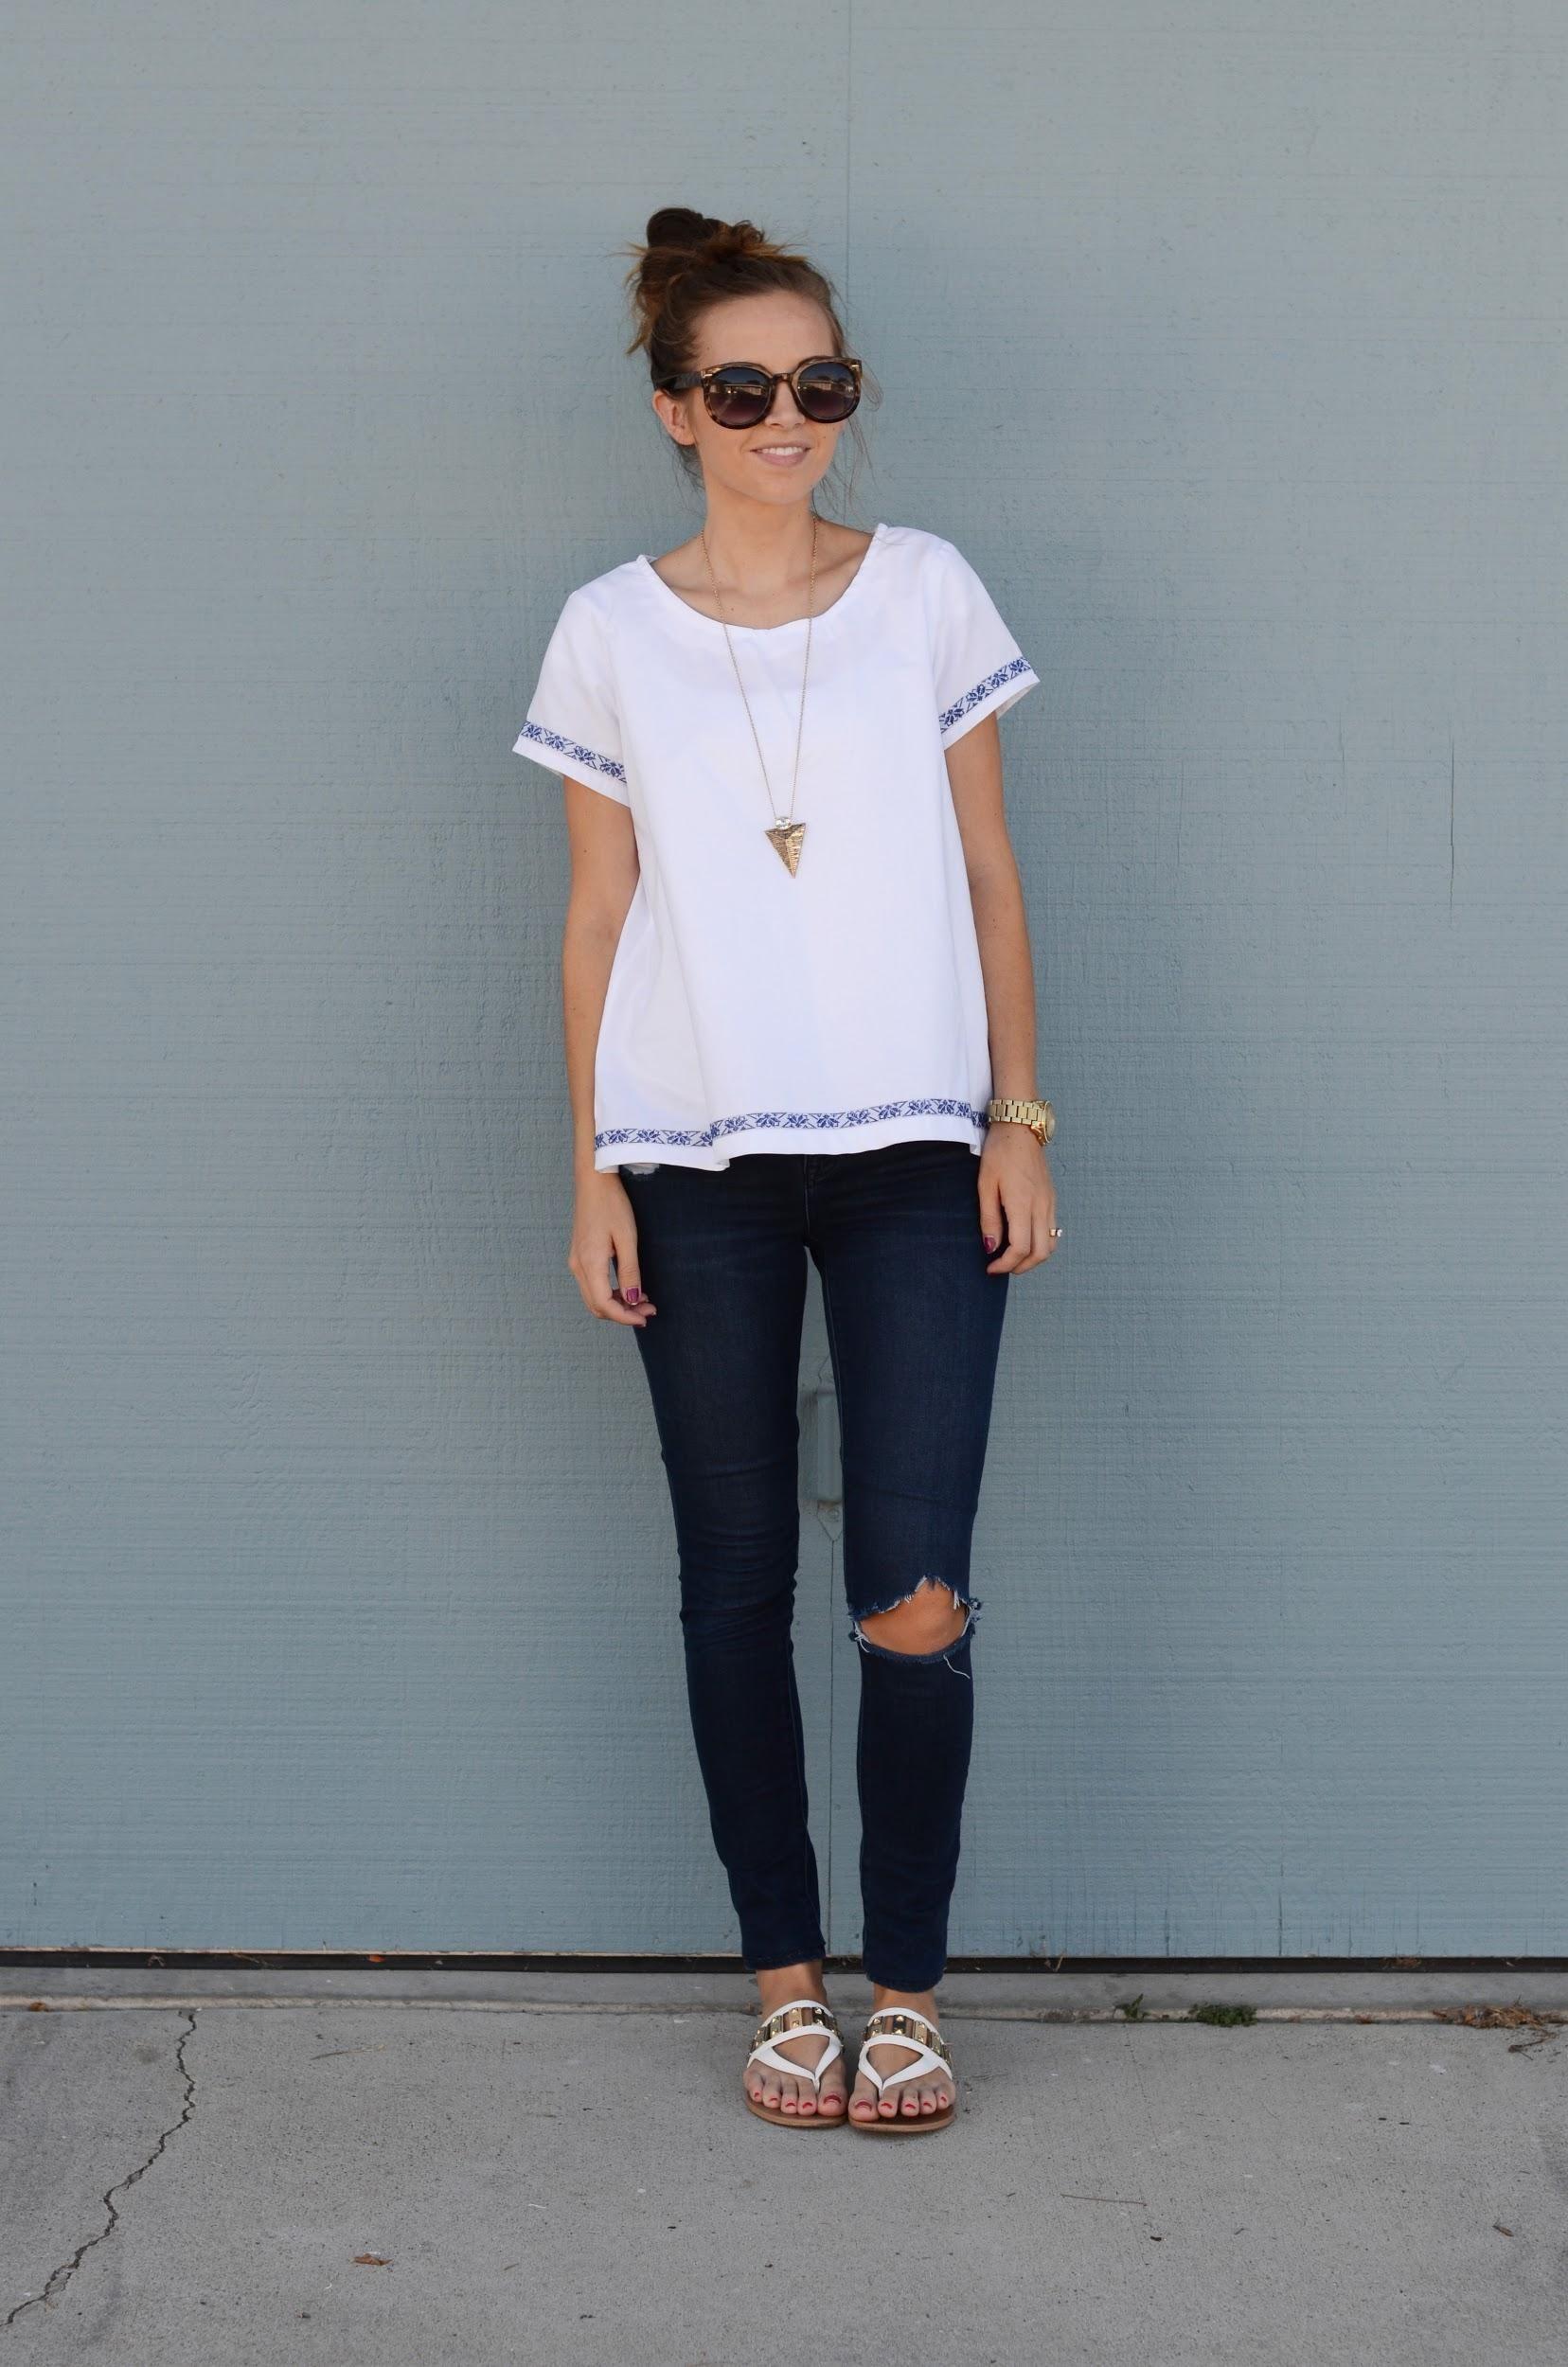 DIY Shirt // DIY Fashion // White Swing Tee // … | Sew with JOANN by ...